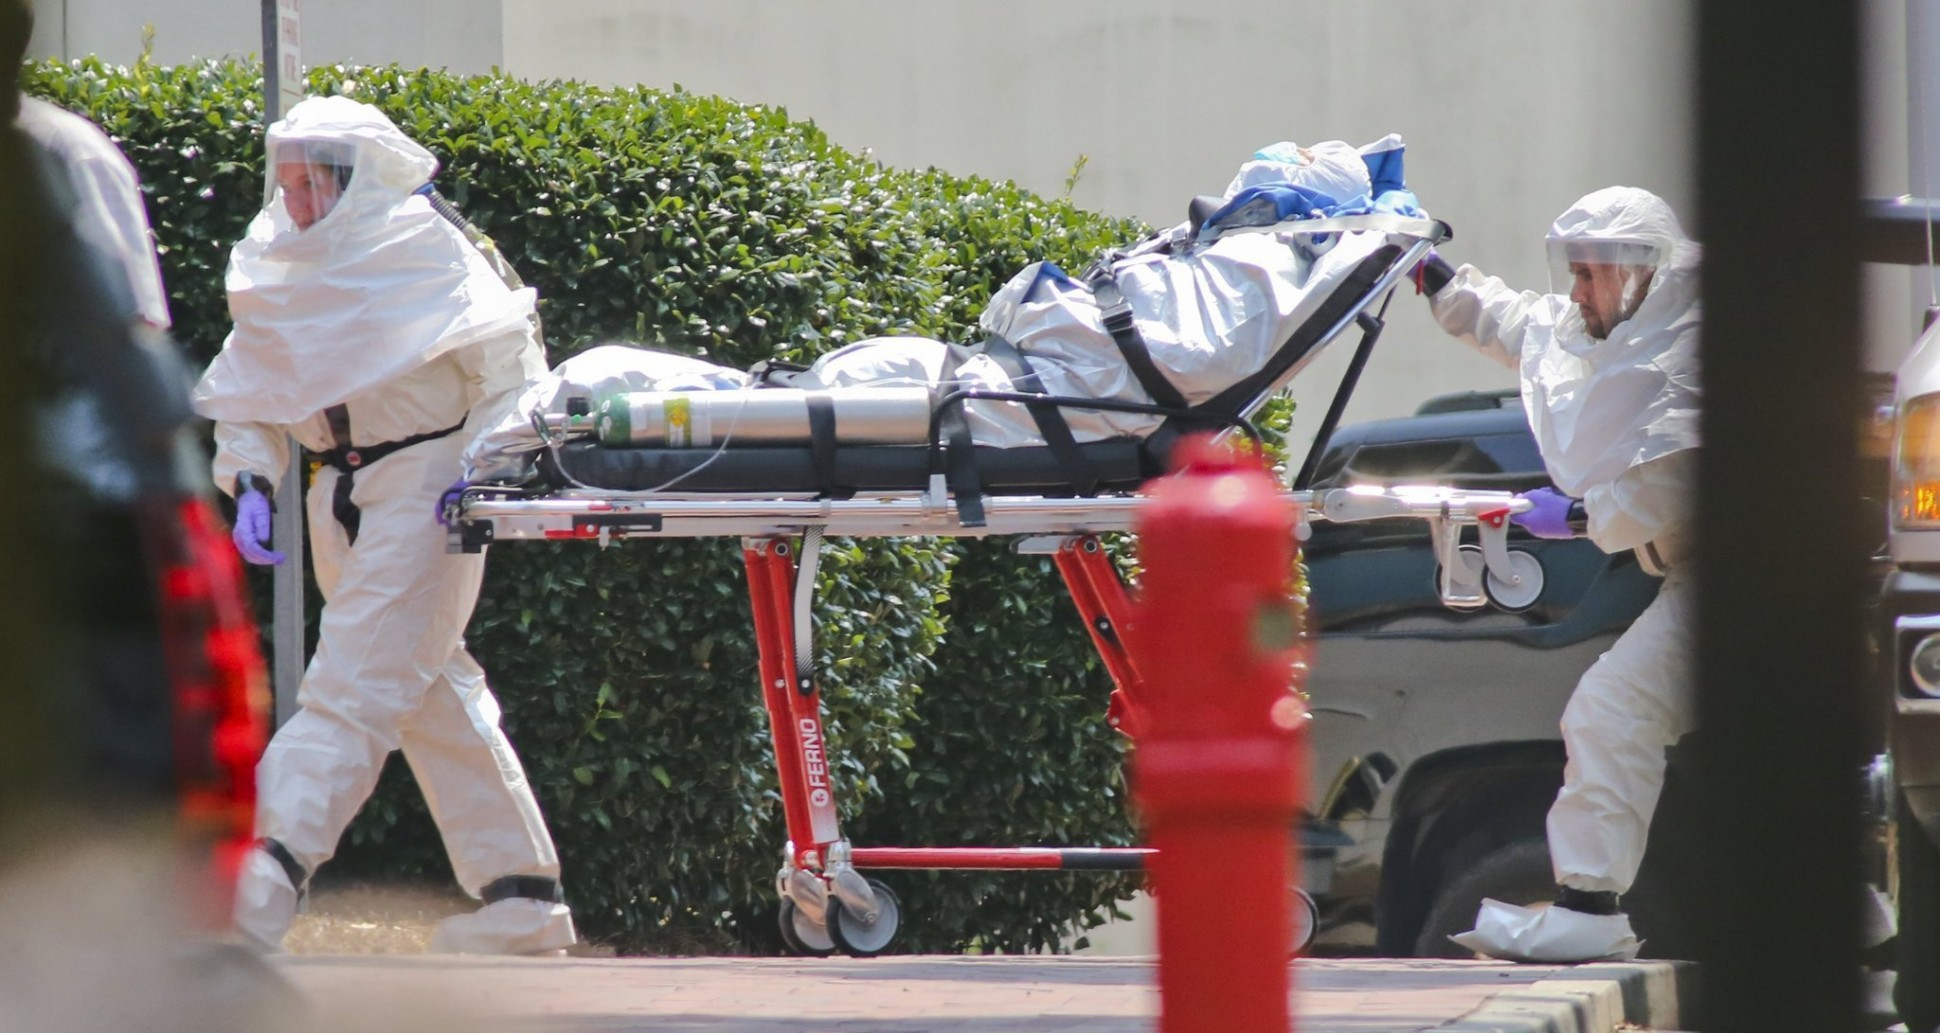 http://blogs-images.forbes.com/dandiamond/files/2014/10/la-na-nn-ebola-missionary-emory-atlanta-arrive-20140805-1940x10331.jpeg